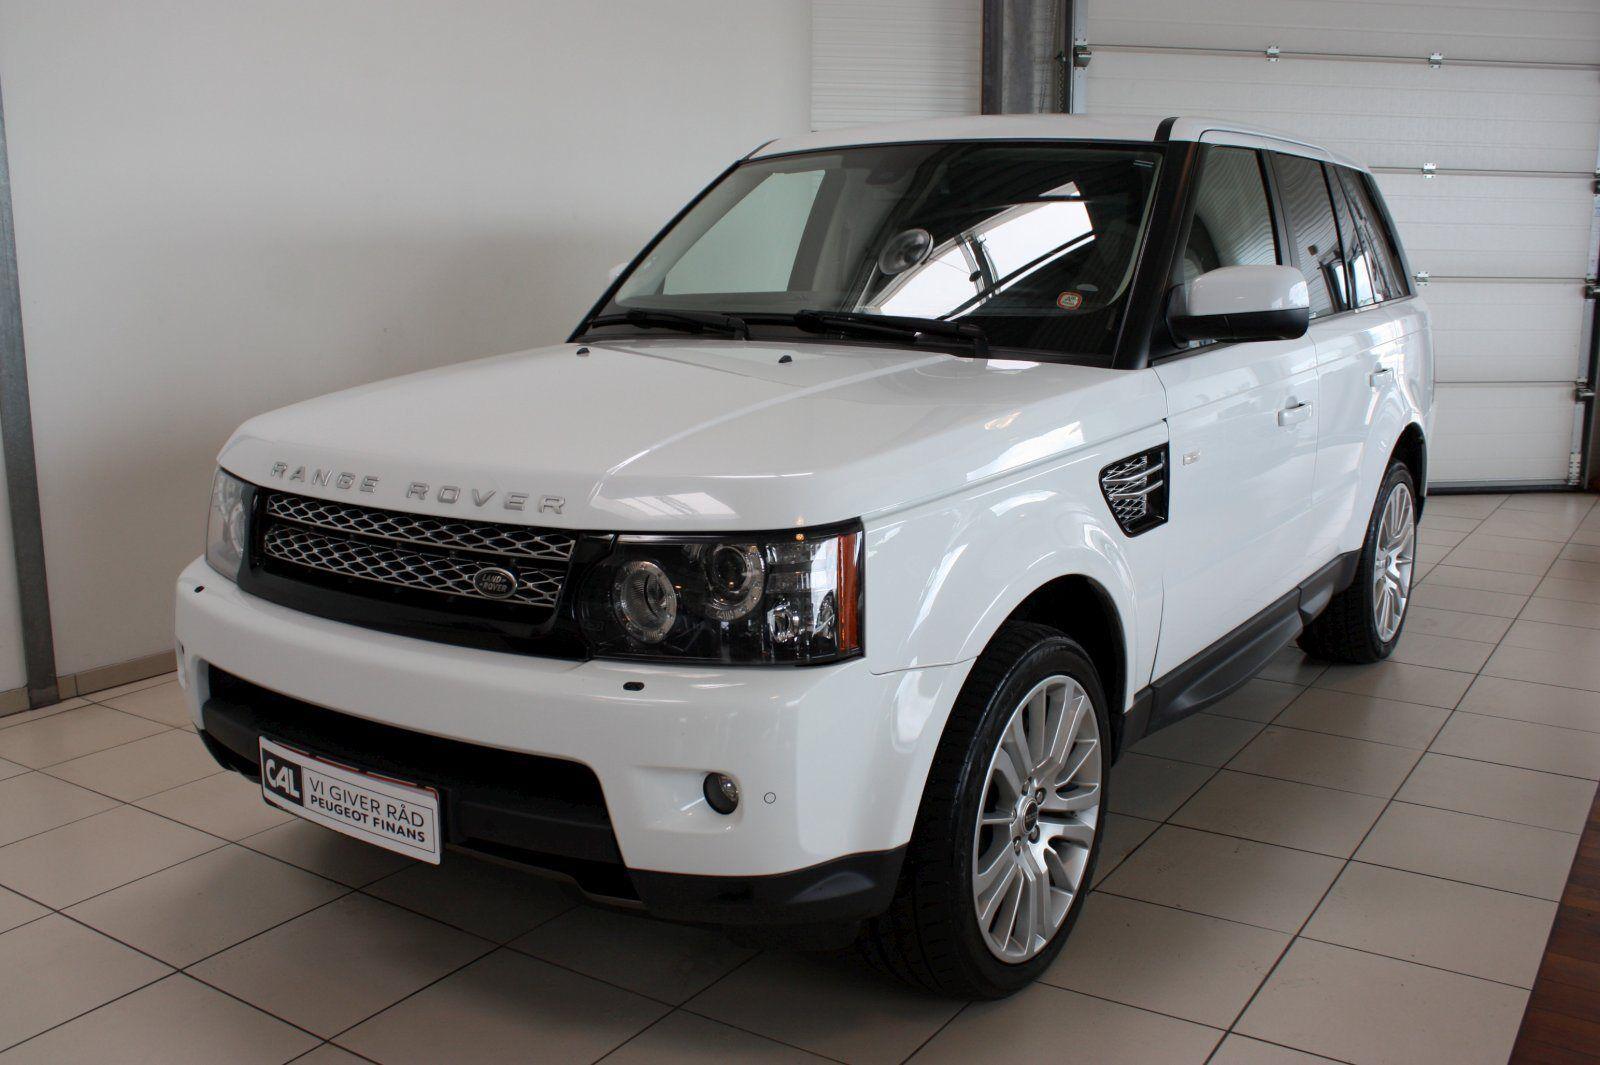 Land Rover Range Rover Sport 3,0 SDV6 SE aut. 5d - 499.900 kr.